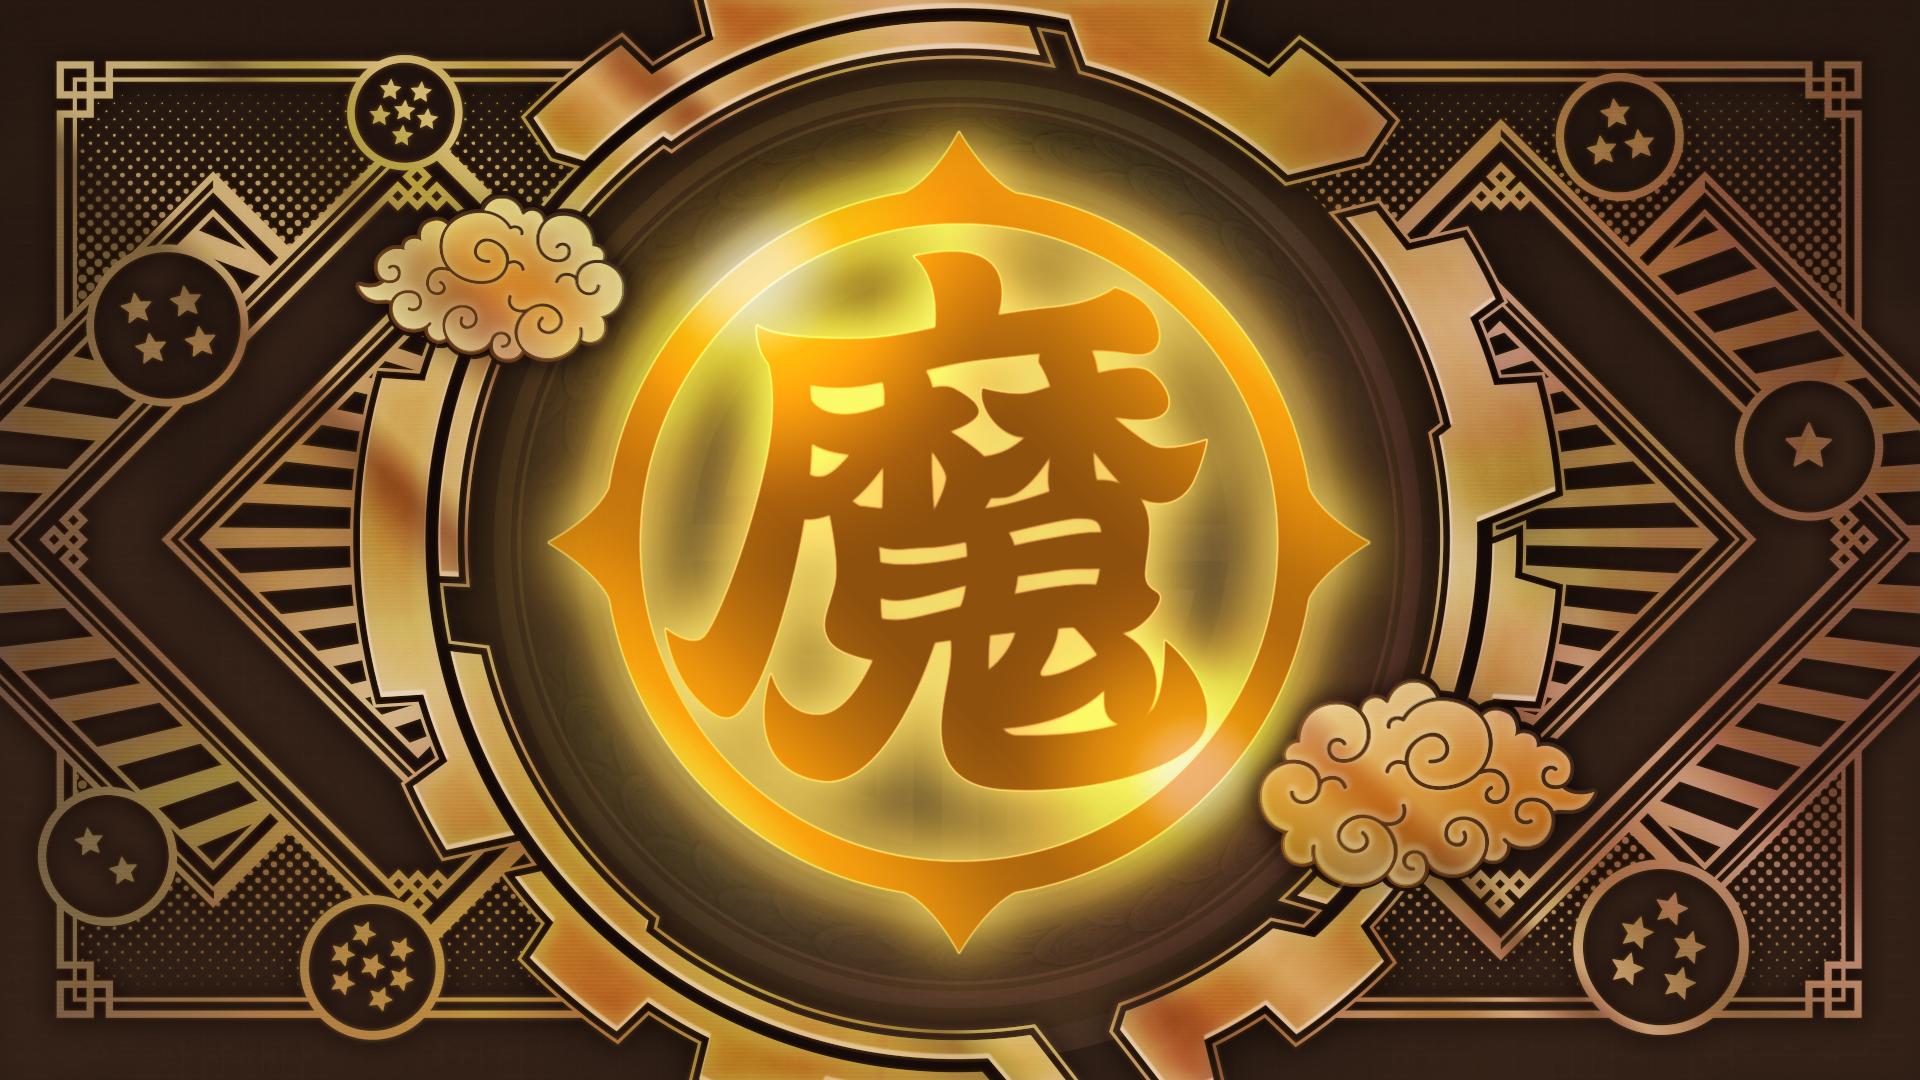 KURSEDSOULS's Gaming Achievement Log   Games Xtreme